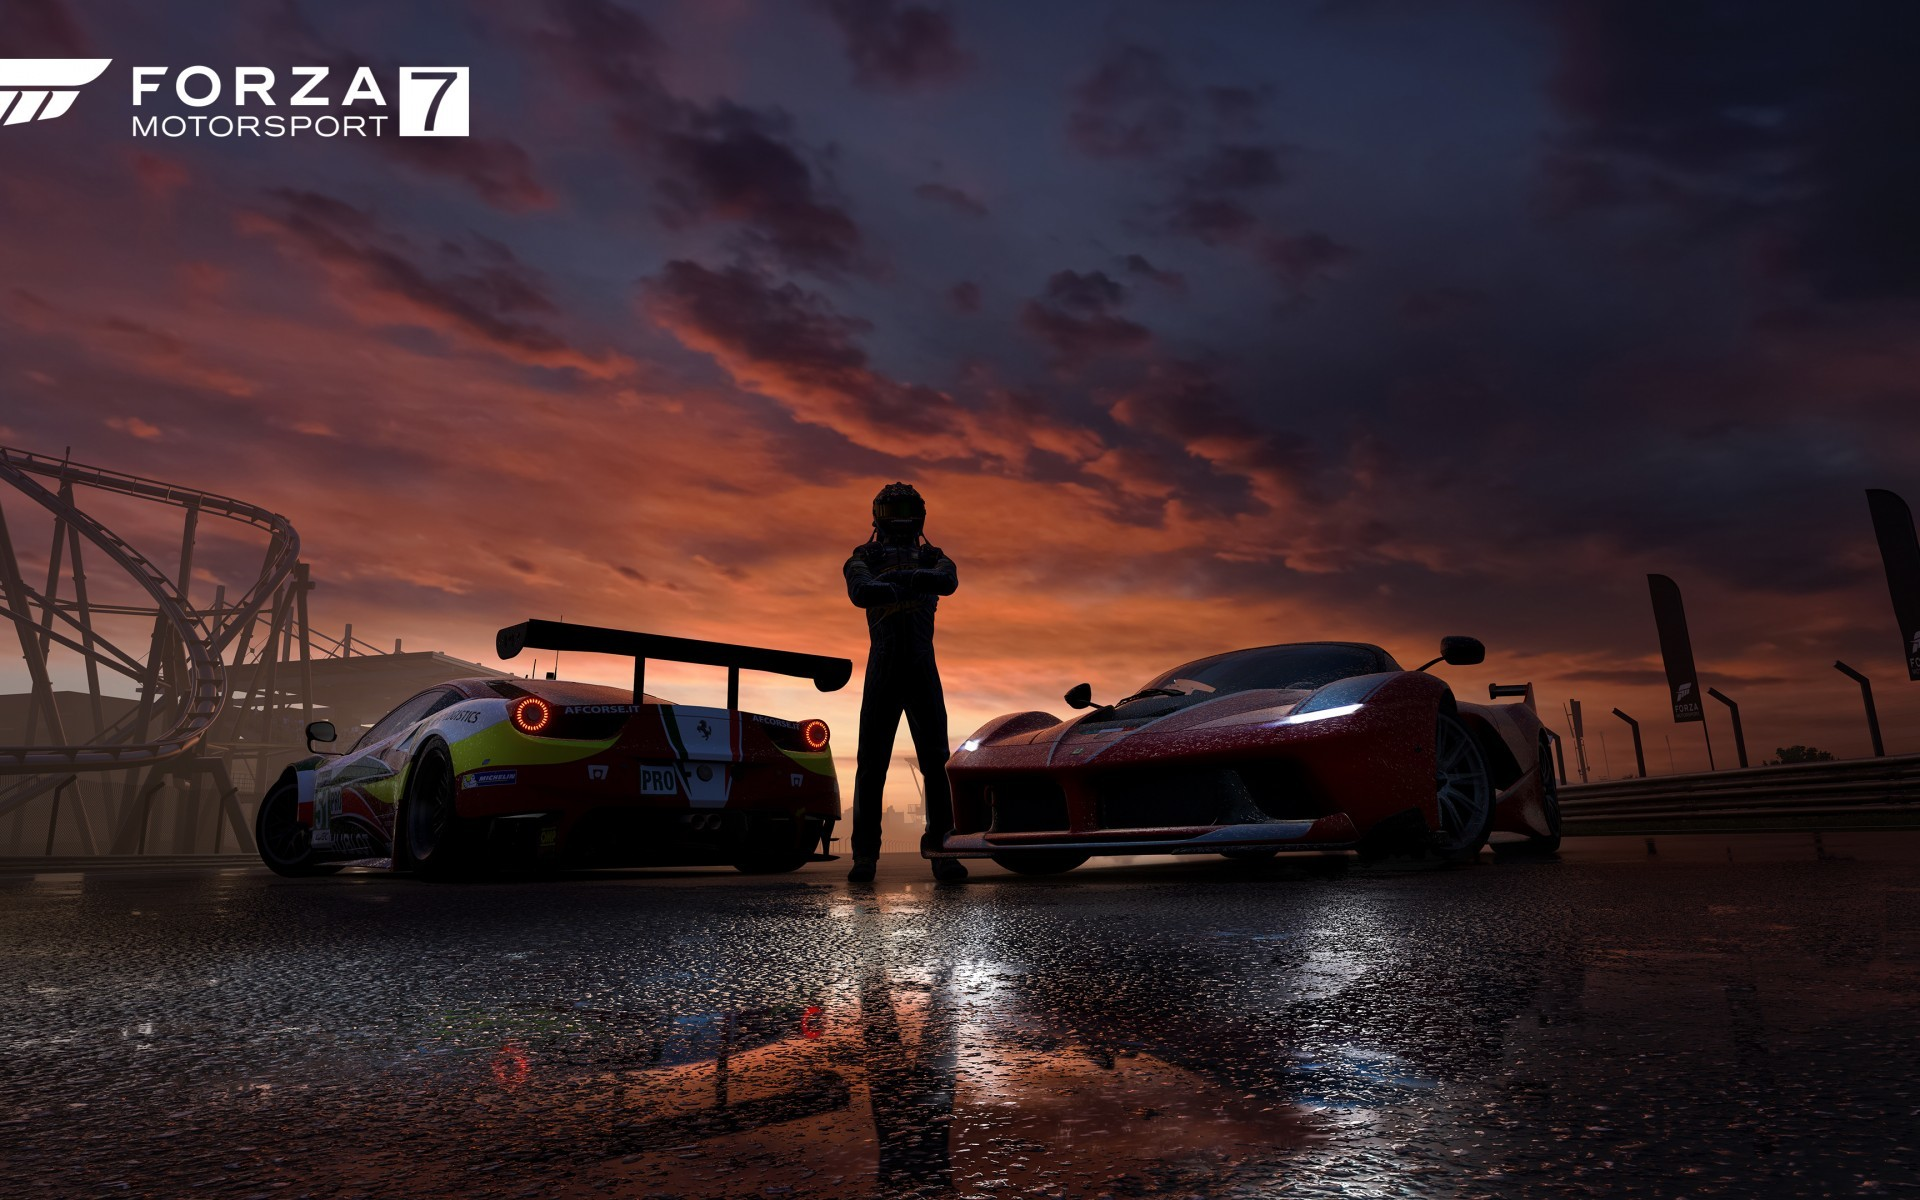 Games / Forza Motorsport 7 Wallpaper